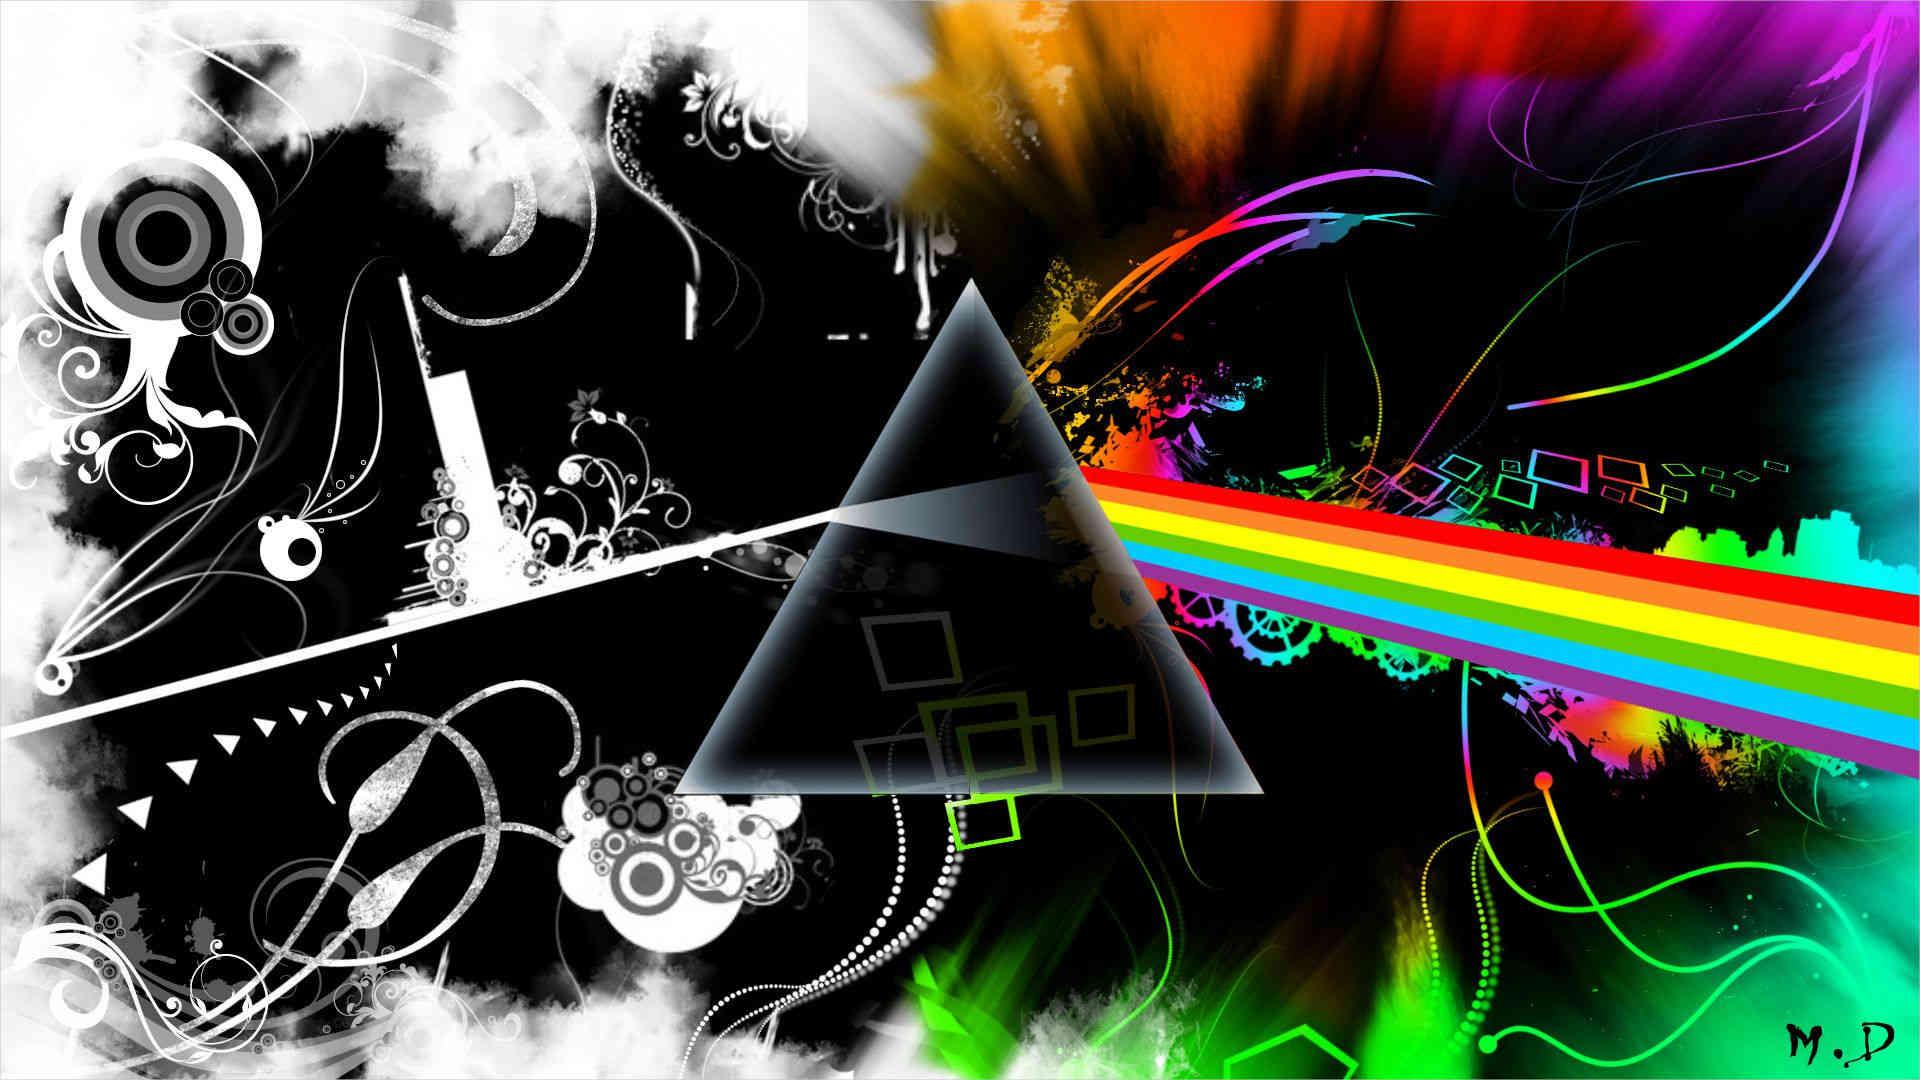 High Resolution Pink Floyd Wallpaper